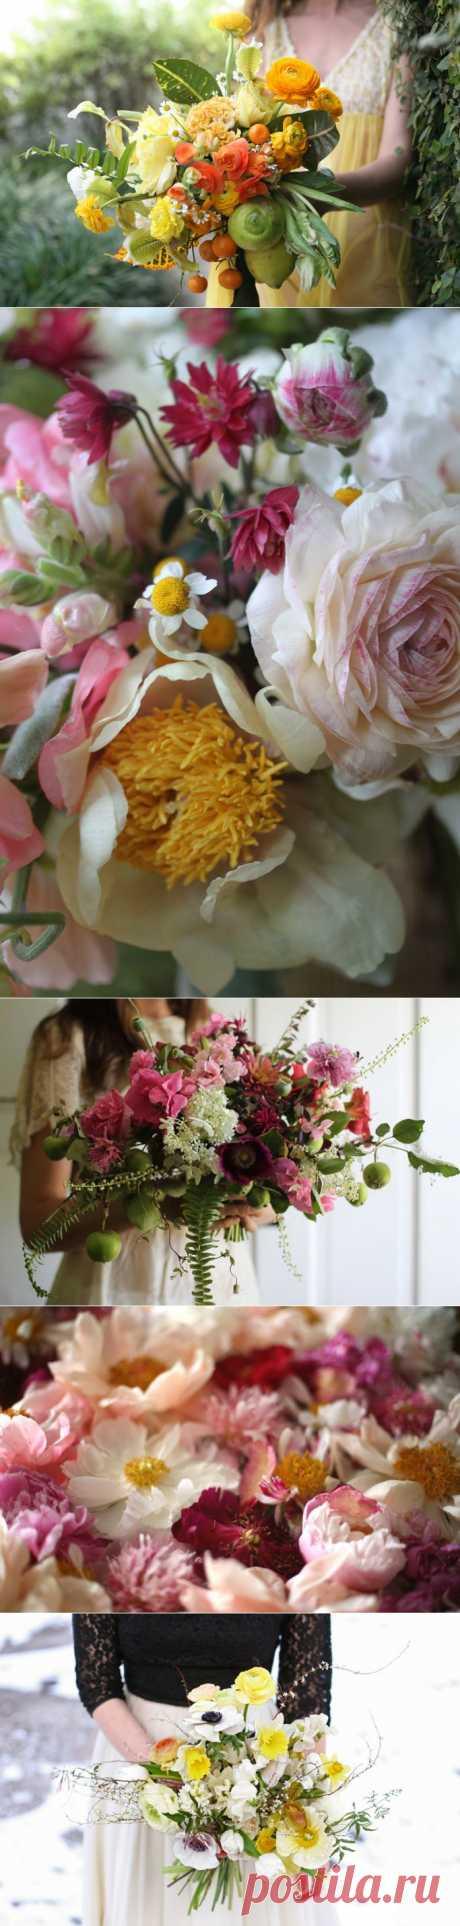 Цветочные букеты Amy Merrick